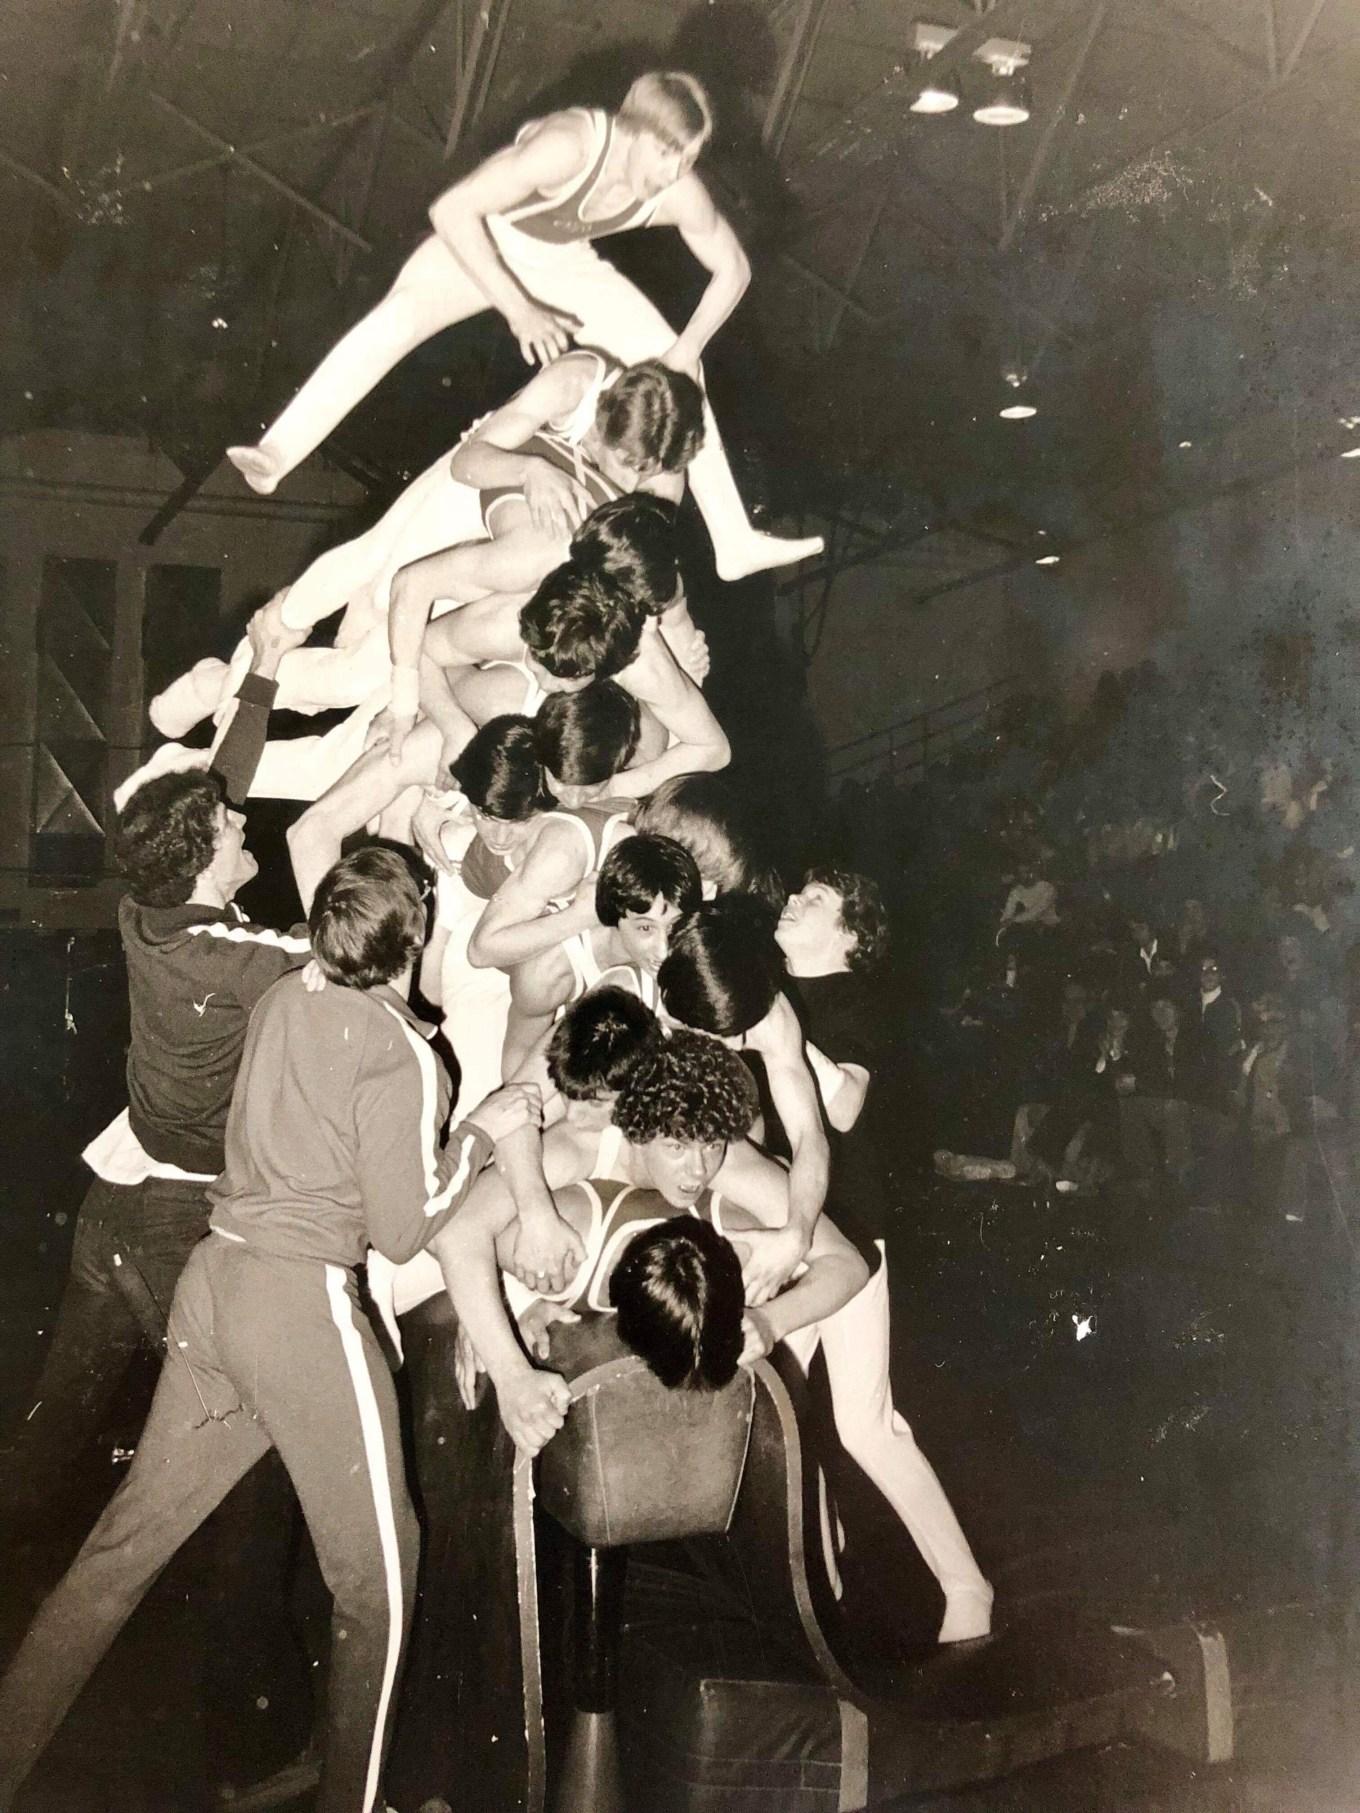 1980 BHS gymnastics team shenanigans. Photo credit: Merrill B. Clark